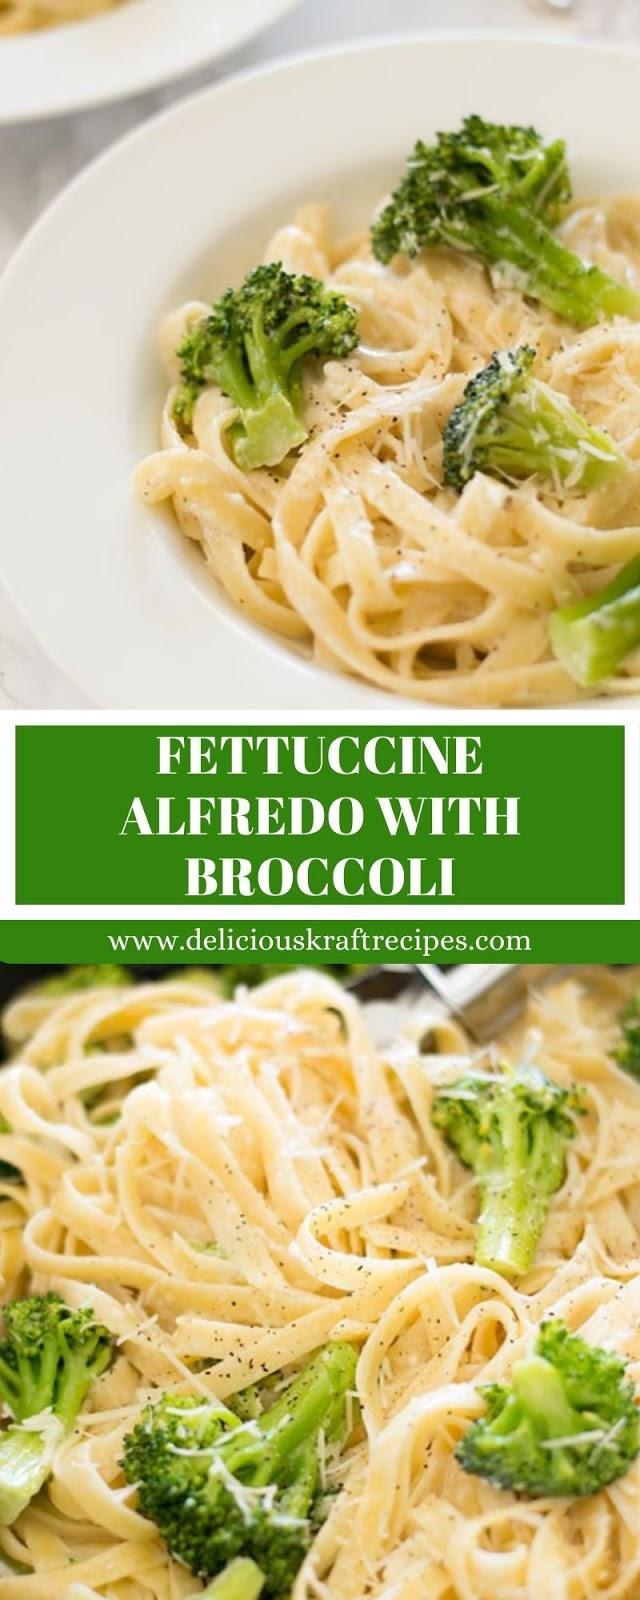 FETTUCCINE ALFREDO WITH BROCCOLI